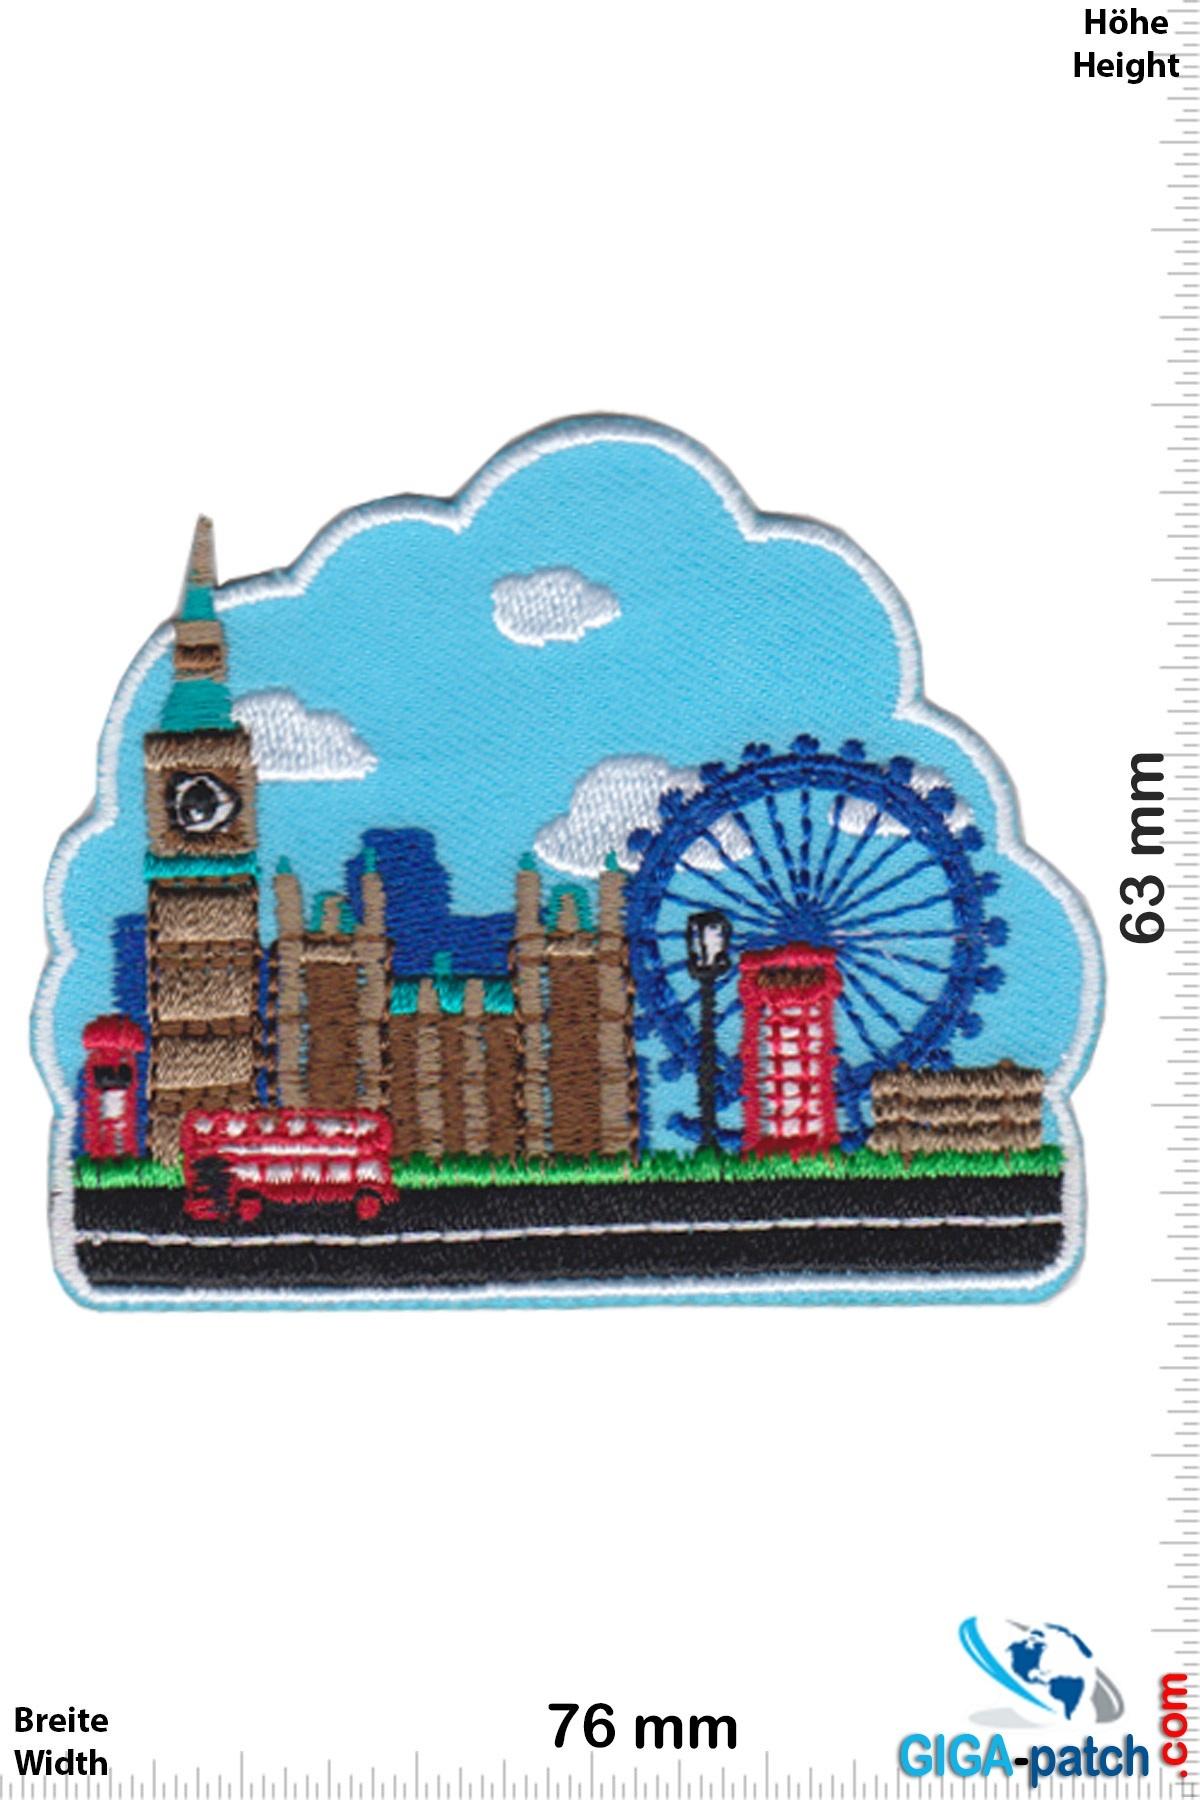 England, England London - Big Ben - UK